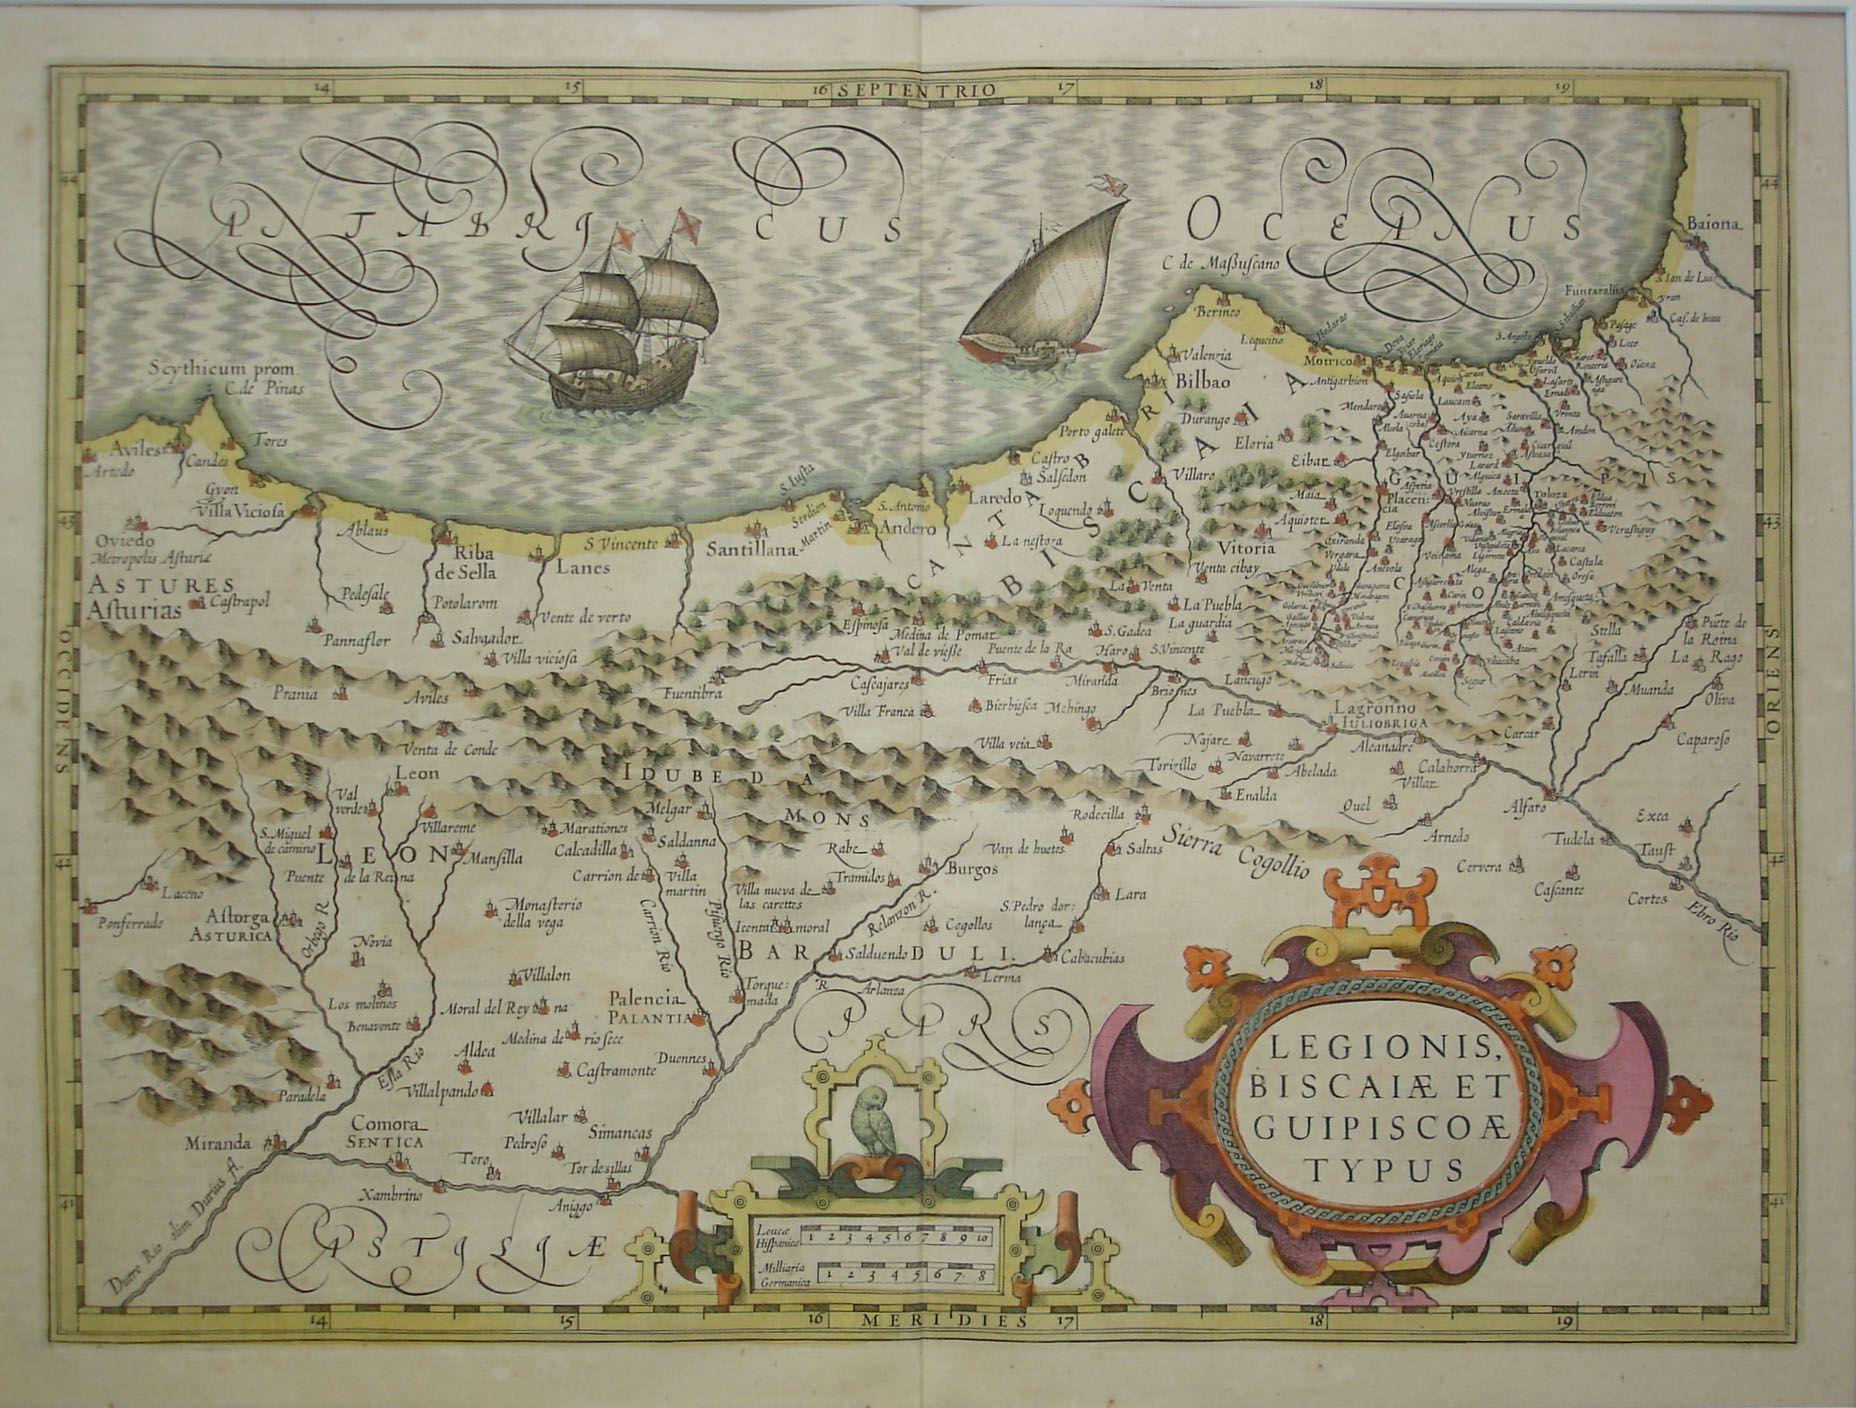 País Vasco - Grabados Laurence Shand